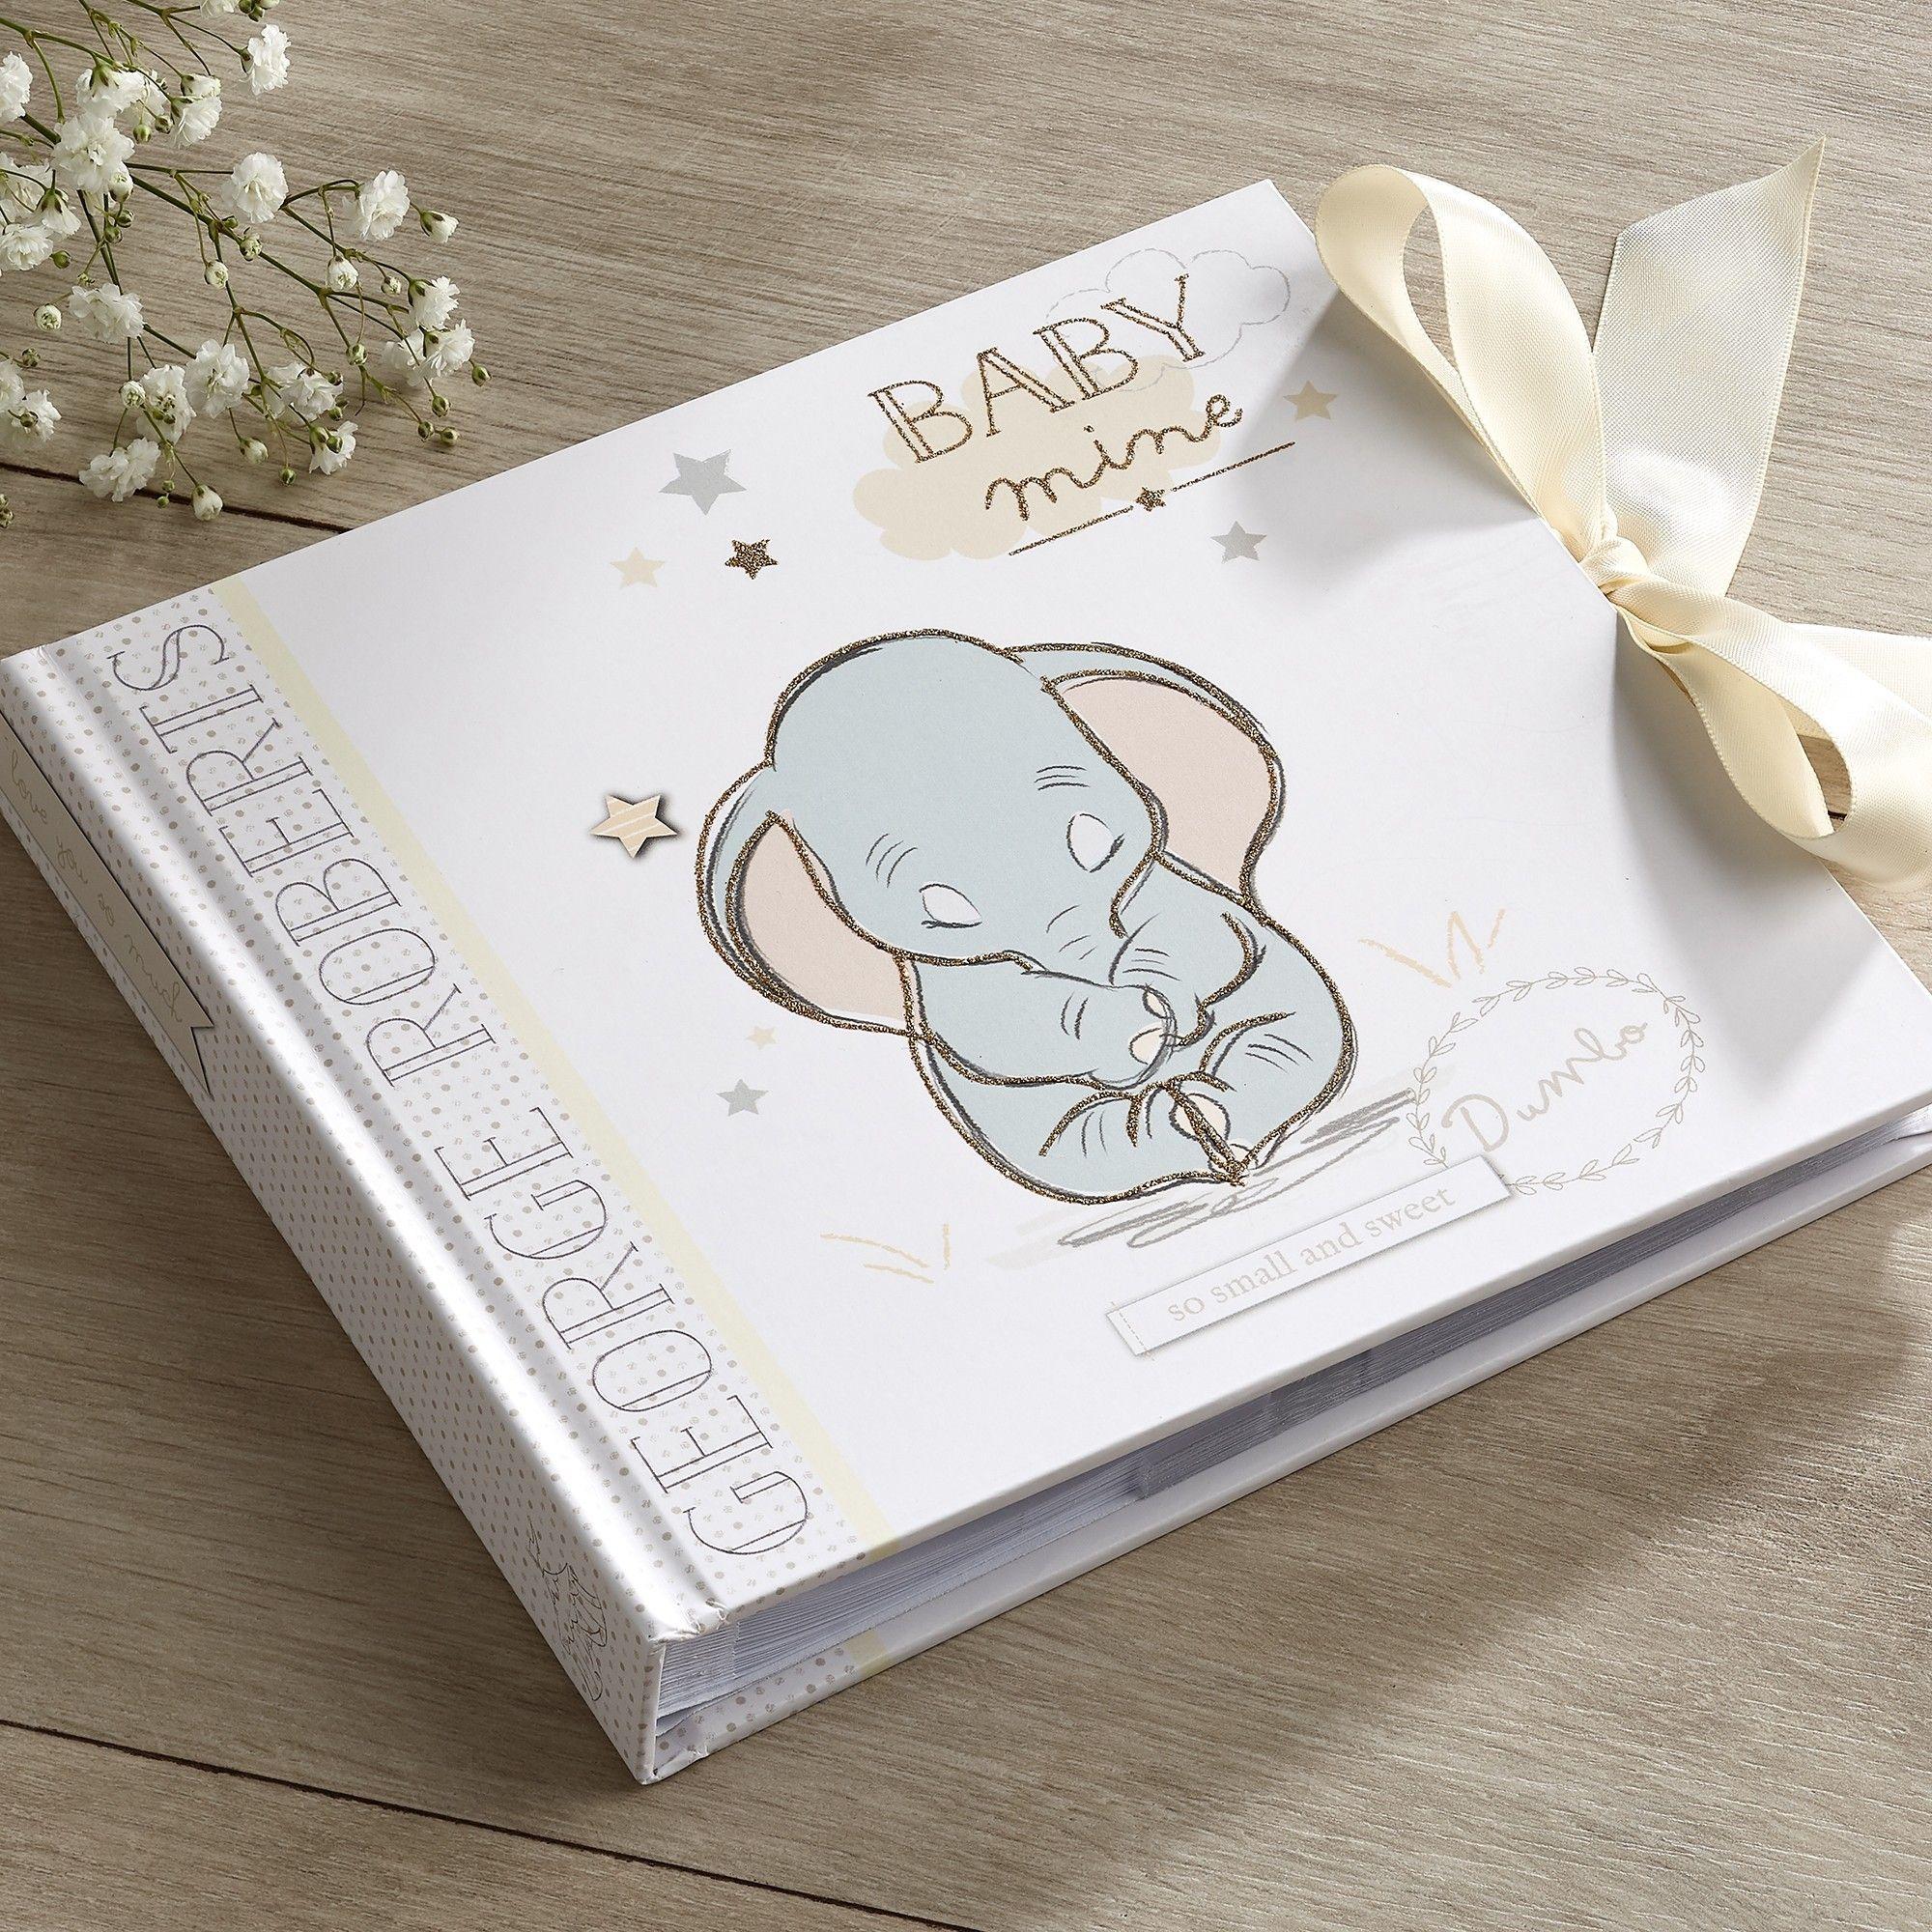 Personalized Disney Dumbo Picture Album